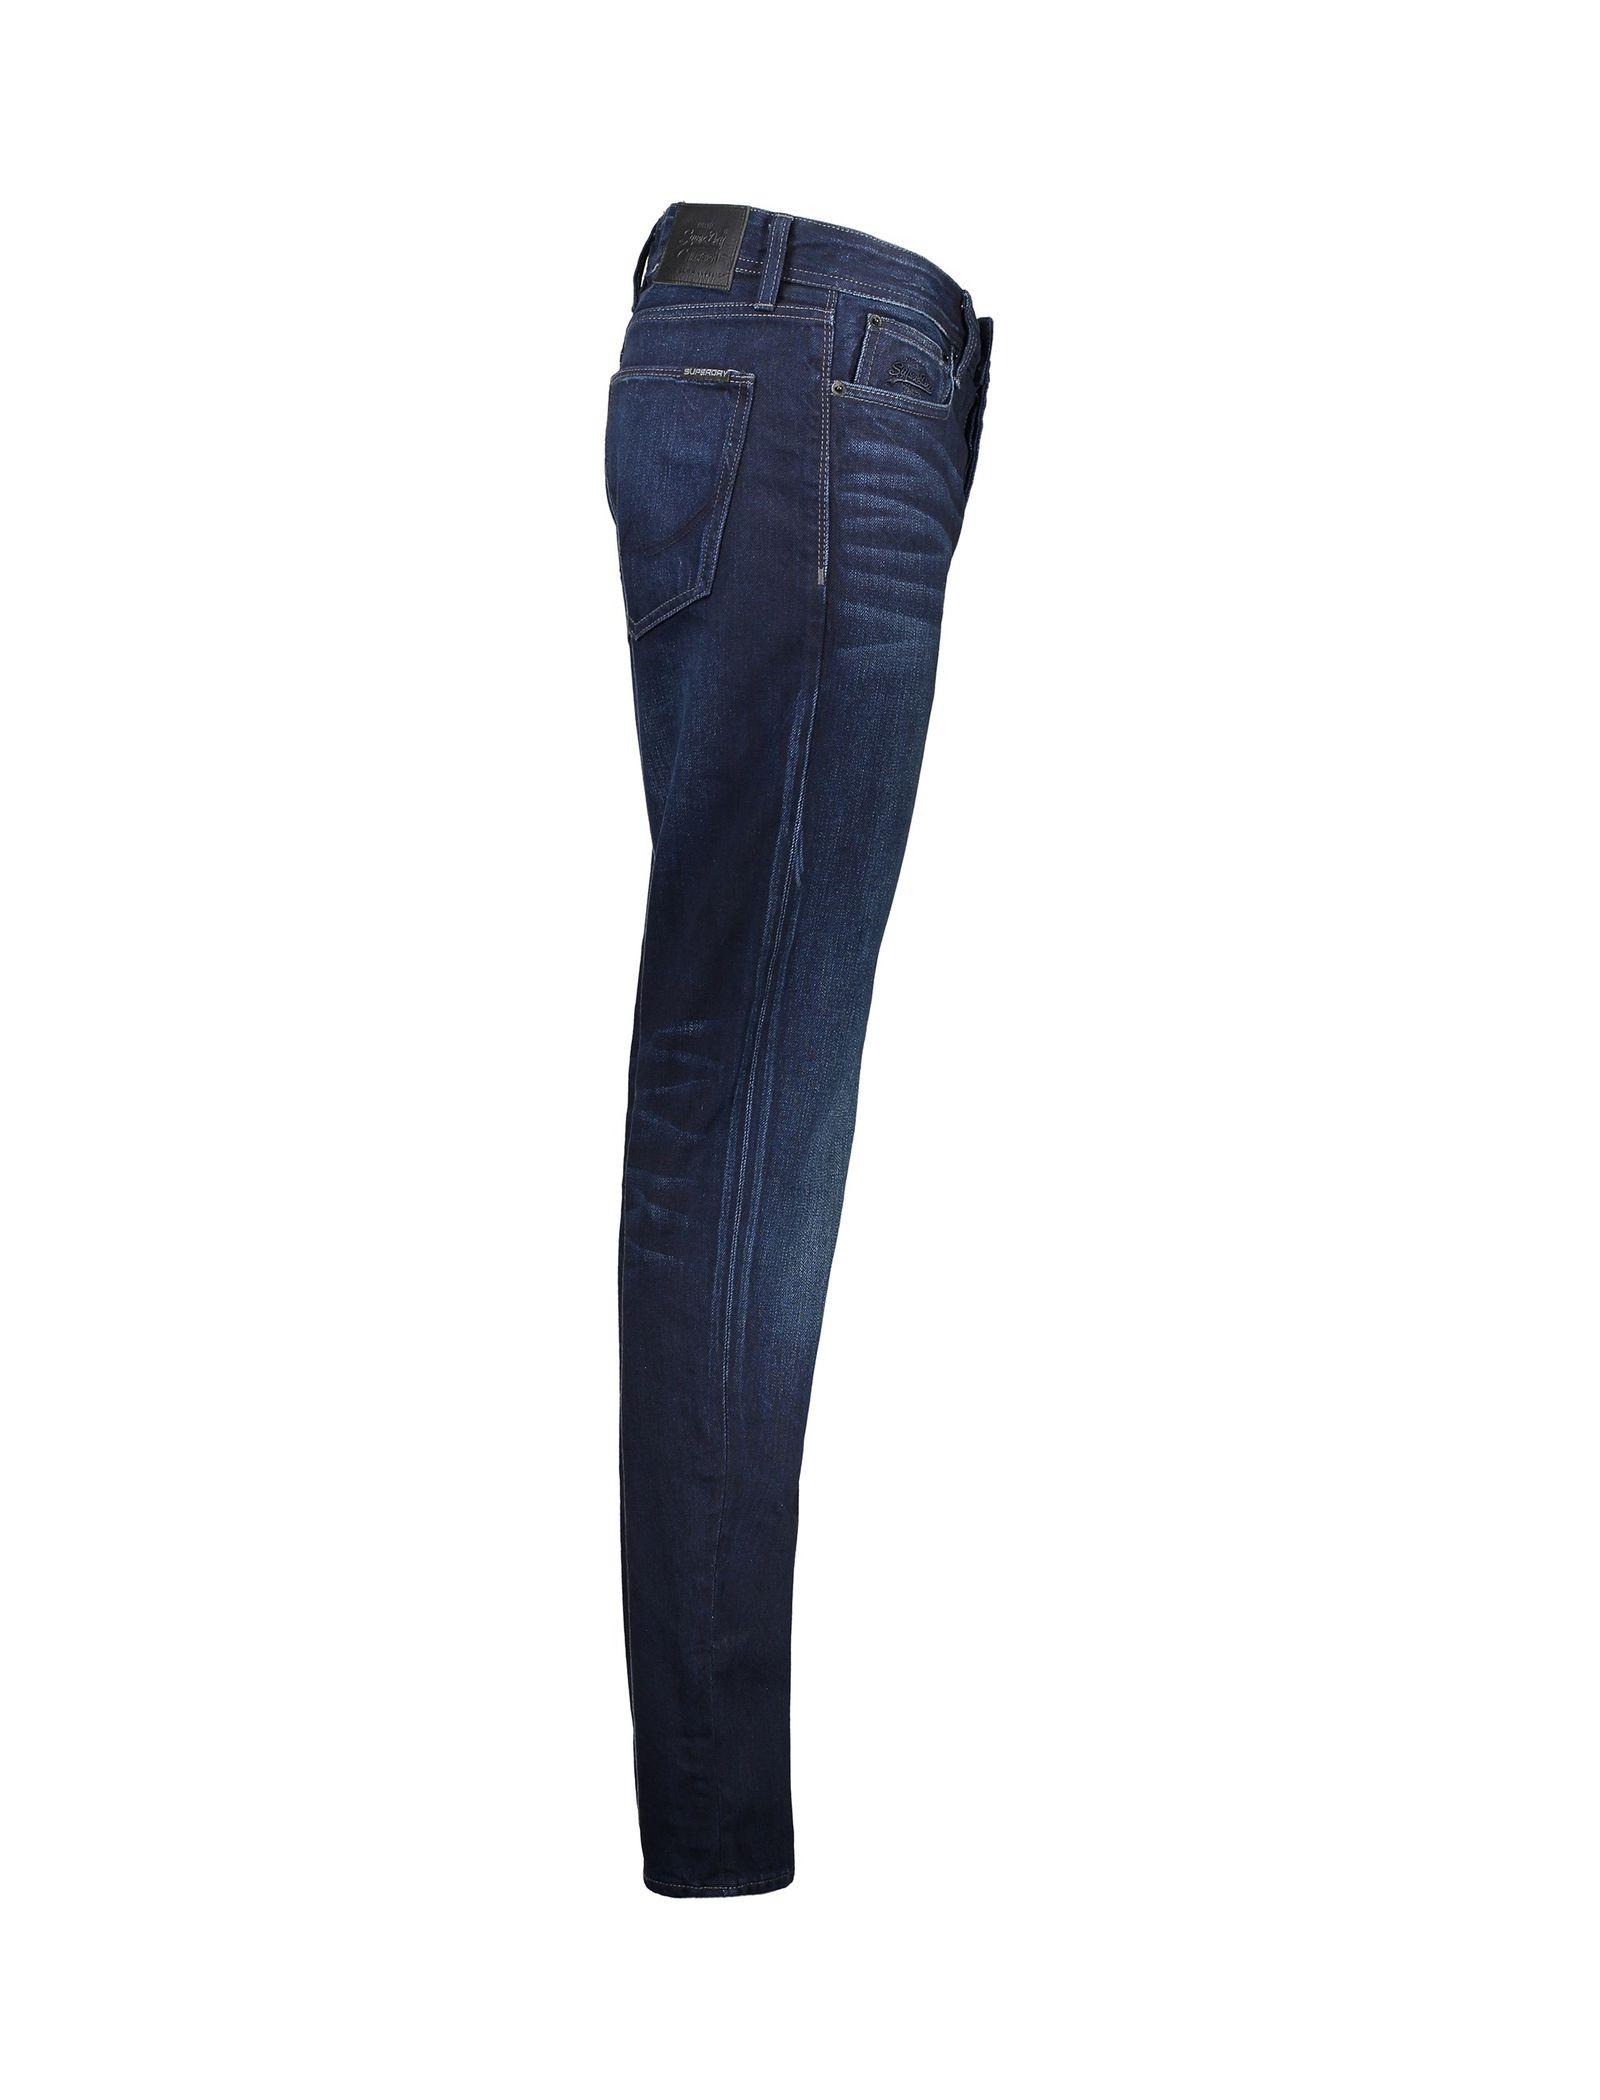 شلوار جین راسته مردانه Copperfill Loose - سوپردرای - آبي تيره - 3